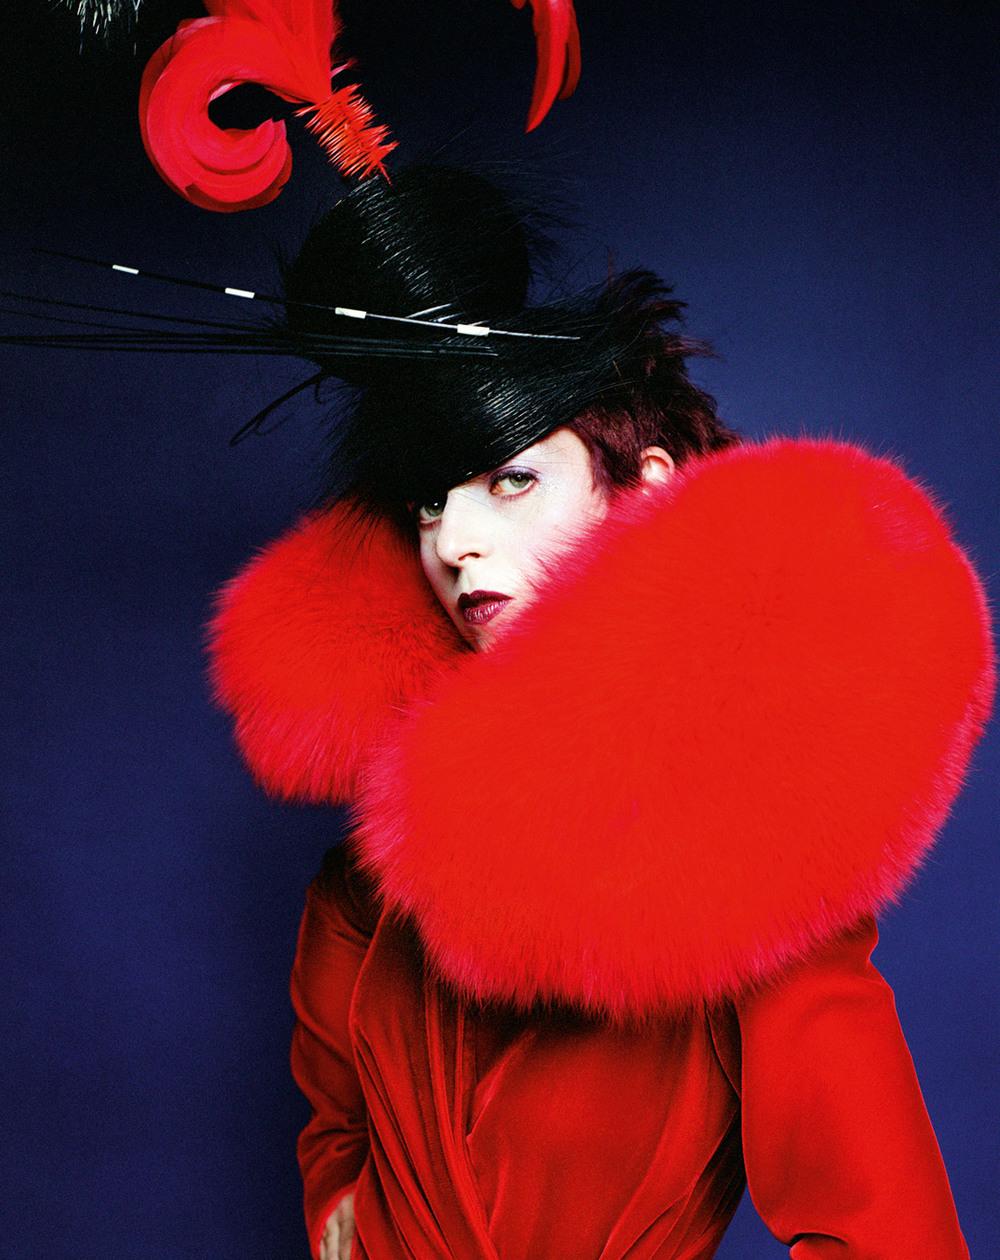 fashionpack: Isabella Blow by Mario Testino, 1997